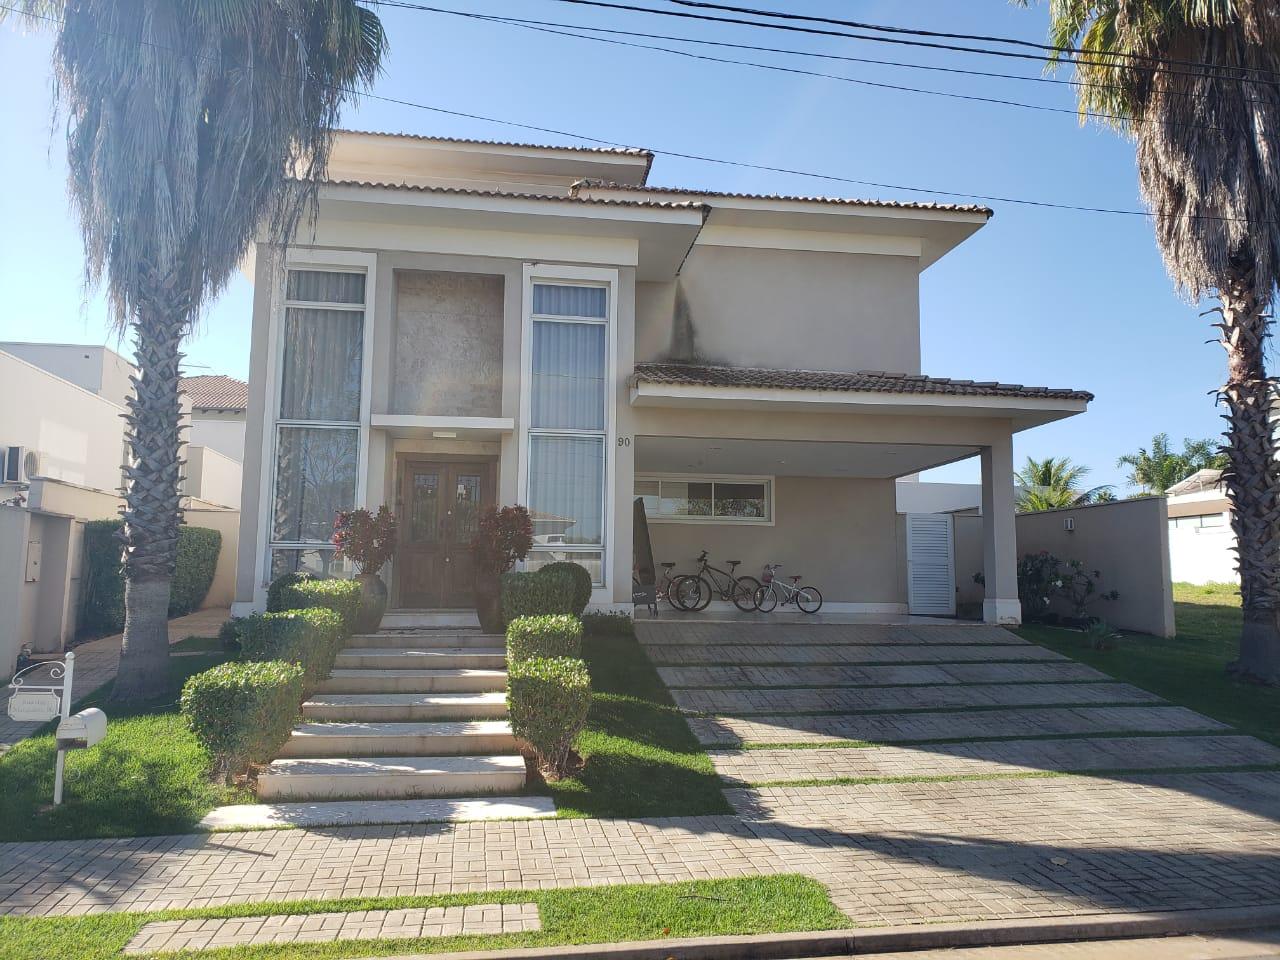 Casa Cond. Fechado  no Jardim Itália (Alphaville), Cuiabá  - MT